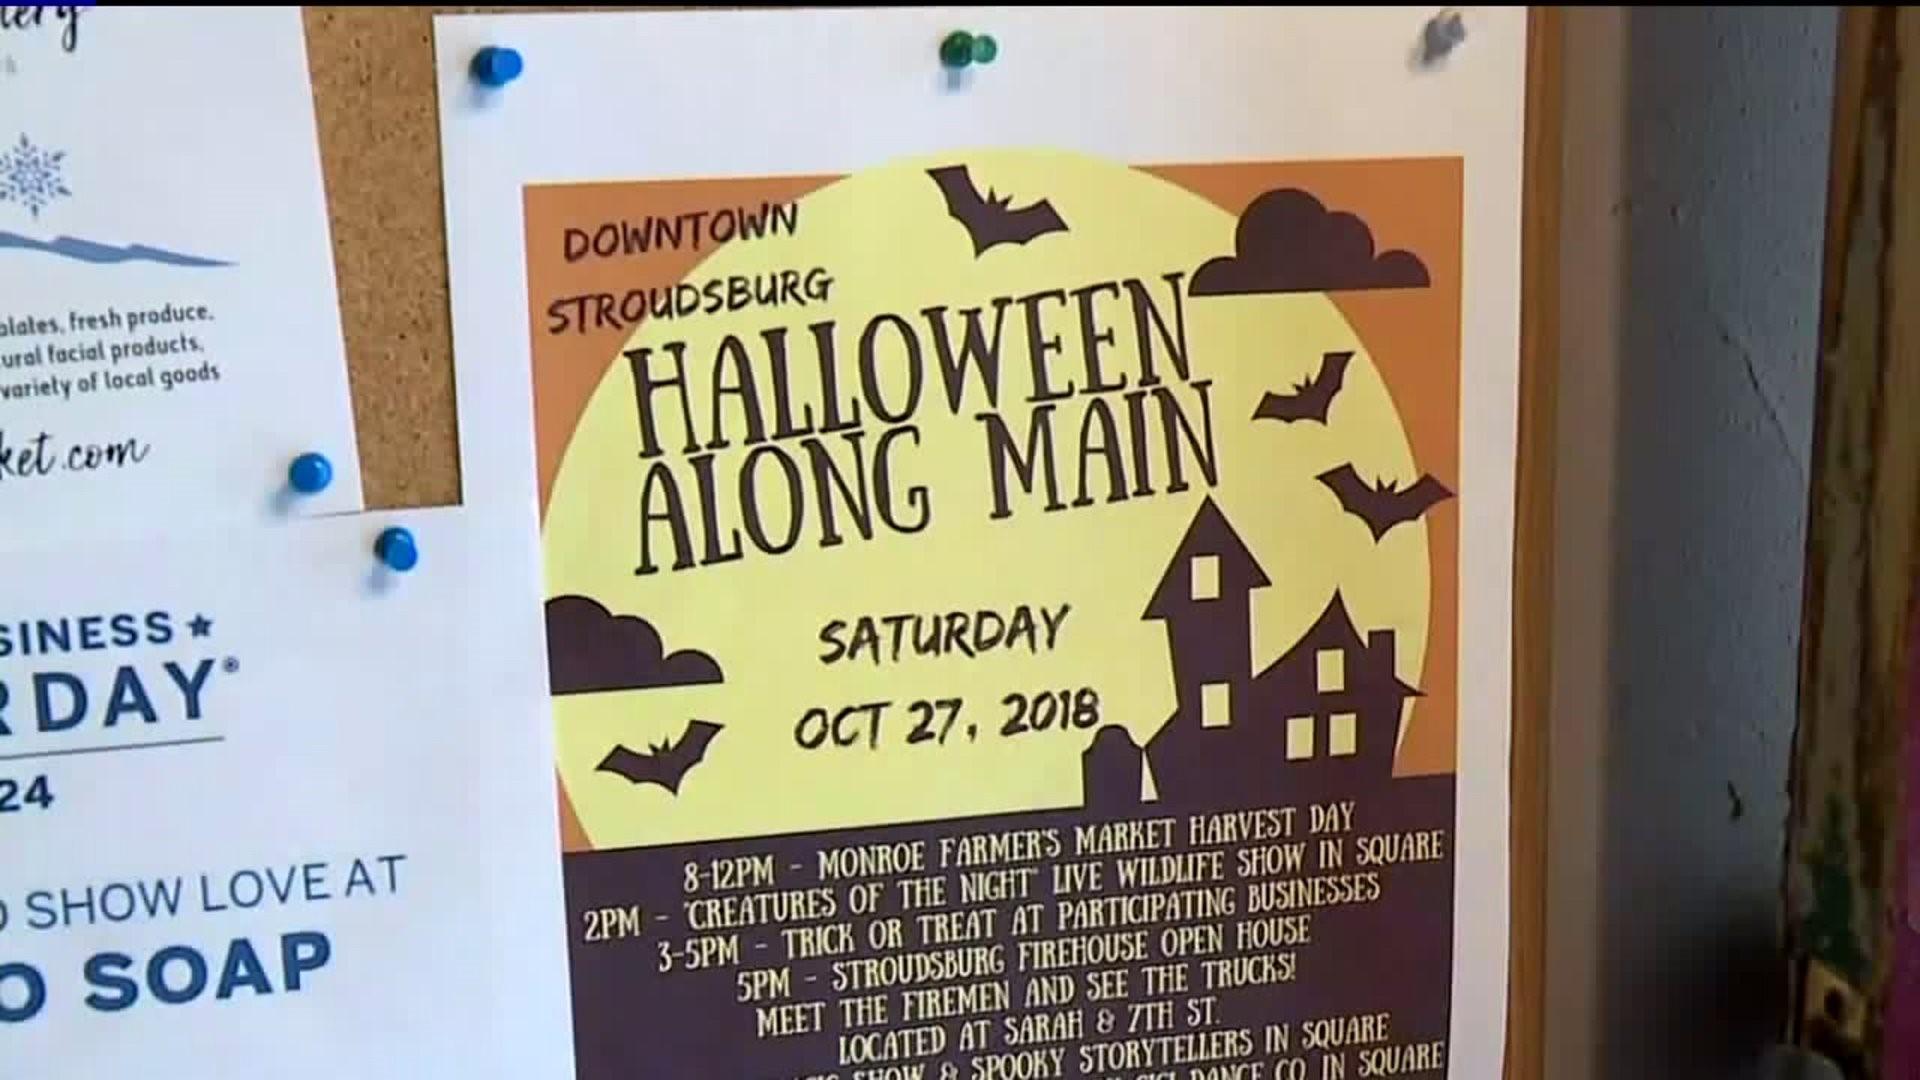 Renegade Winery Halloween 2020 Halloween Along Main' Still on in Stroudsburg   wnep.com